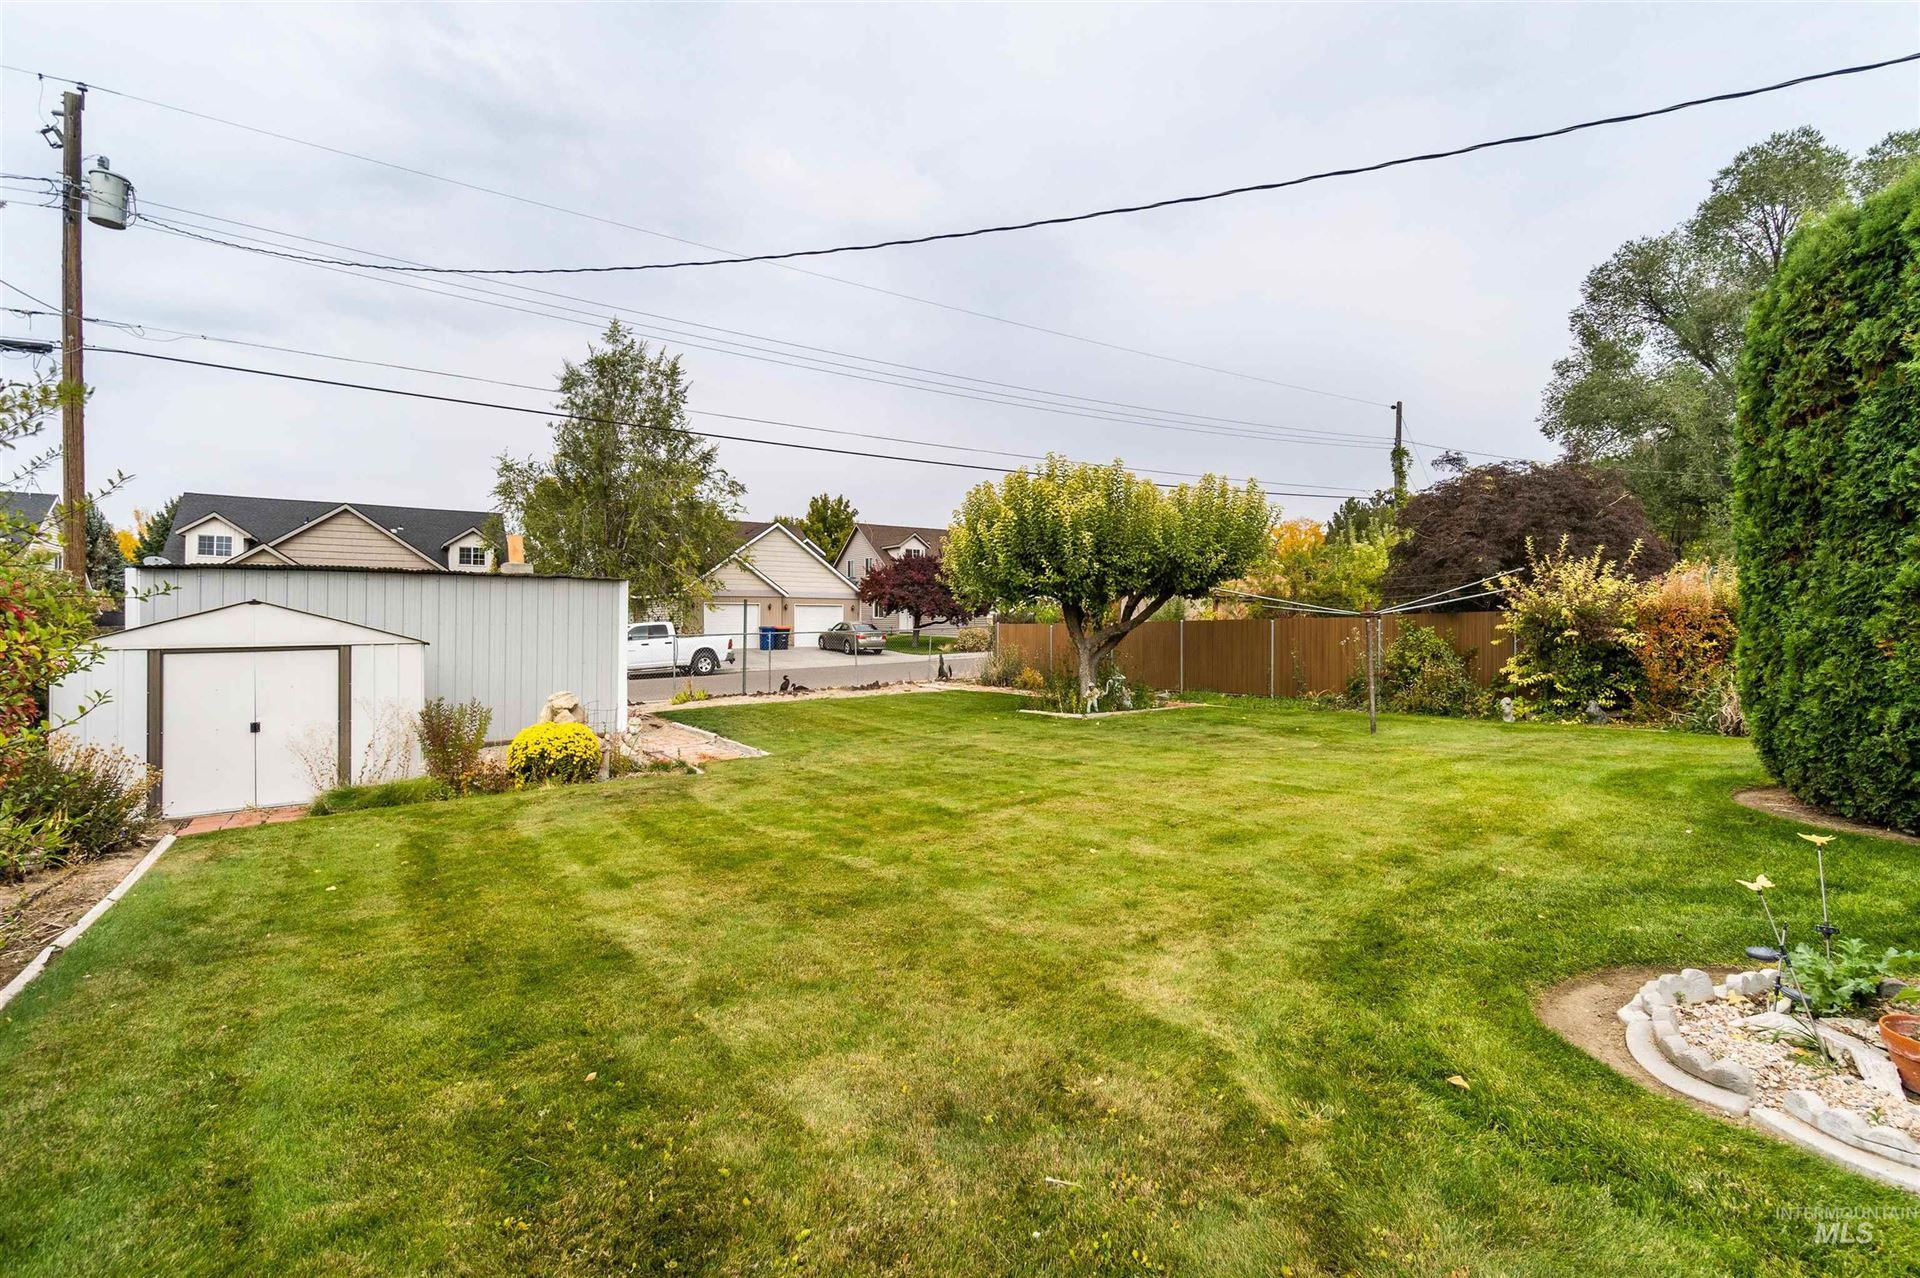 Photo of 1857 E 9th Ave, Twin Falls, ID 83301 (MLS # 98821394)